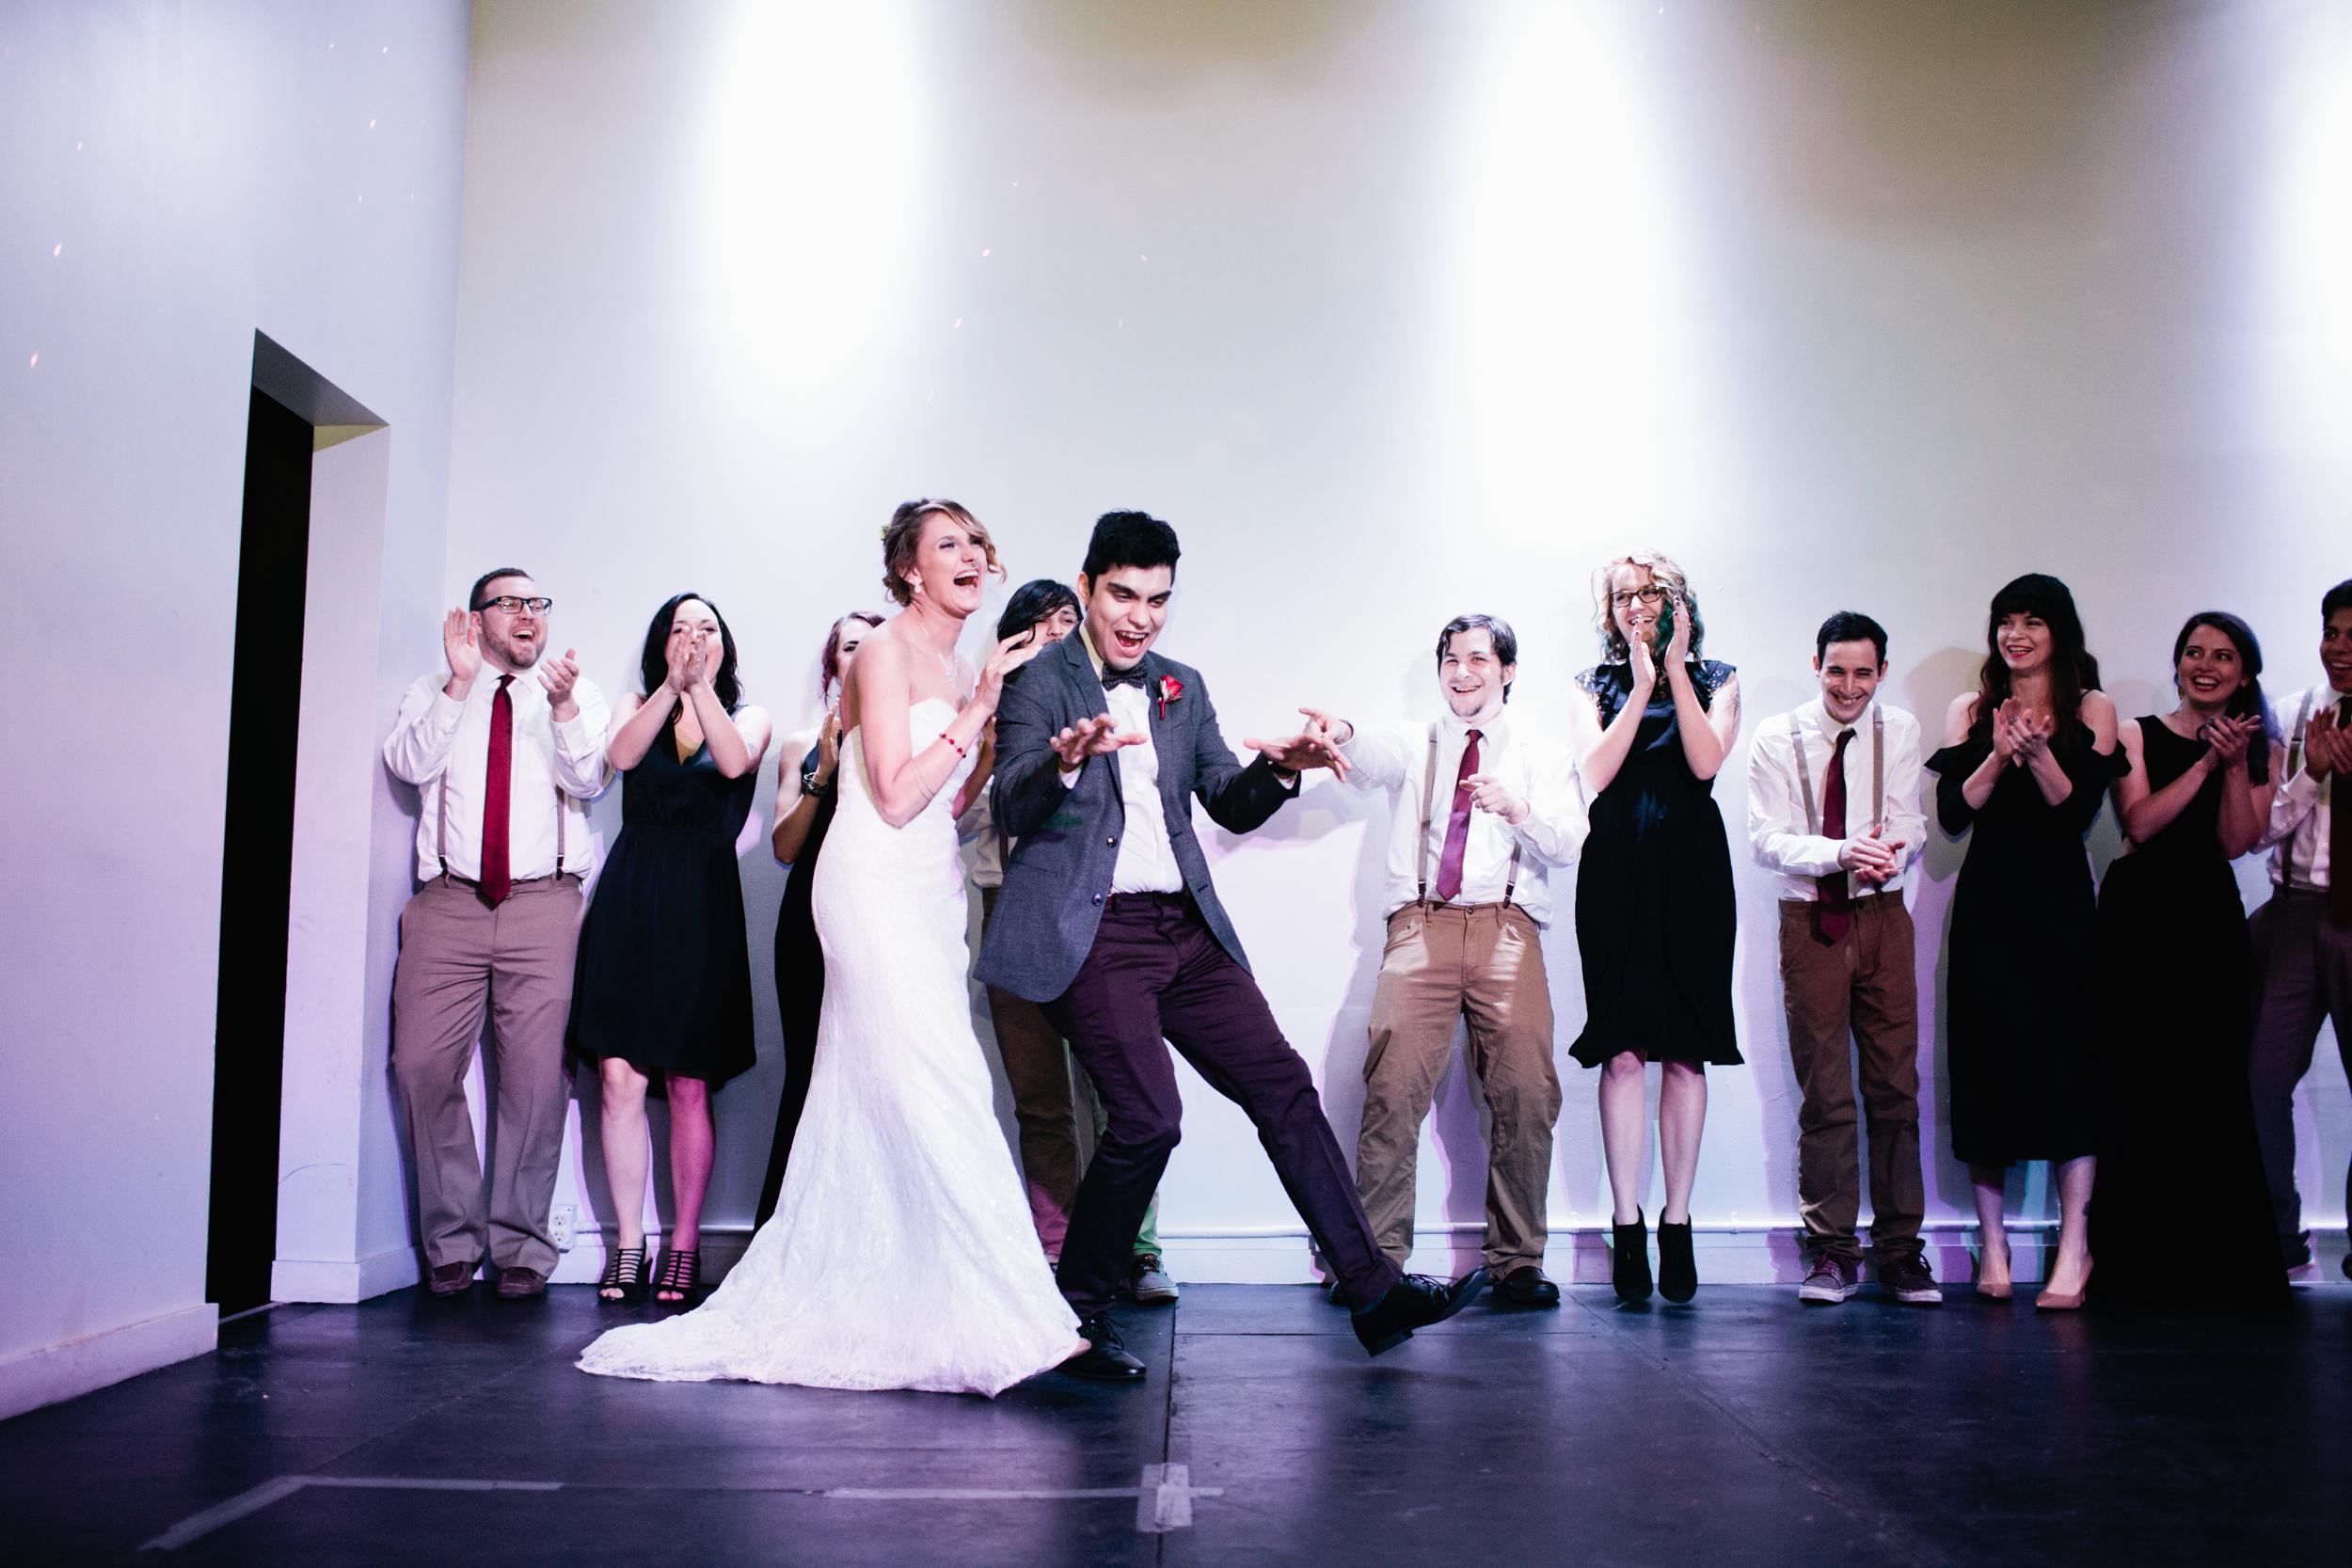 providence-wedding-photographer-143.jpg